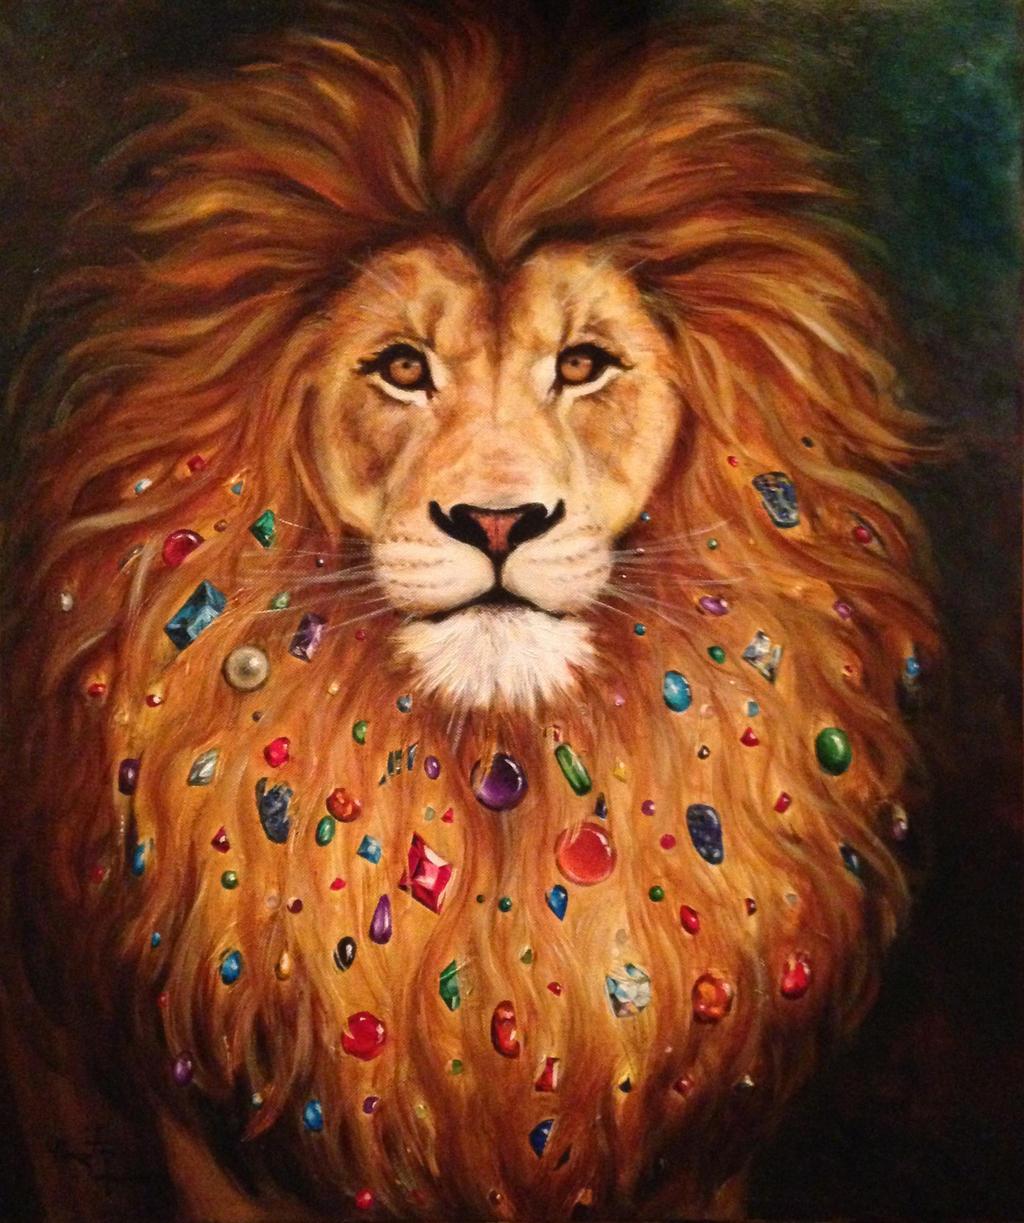 Lion tumblr background - photo#11